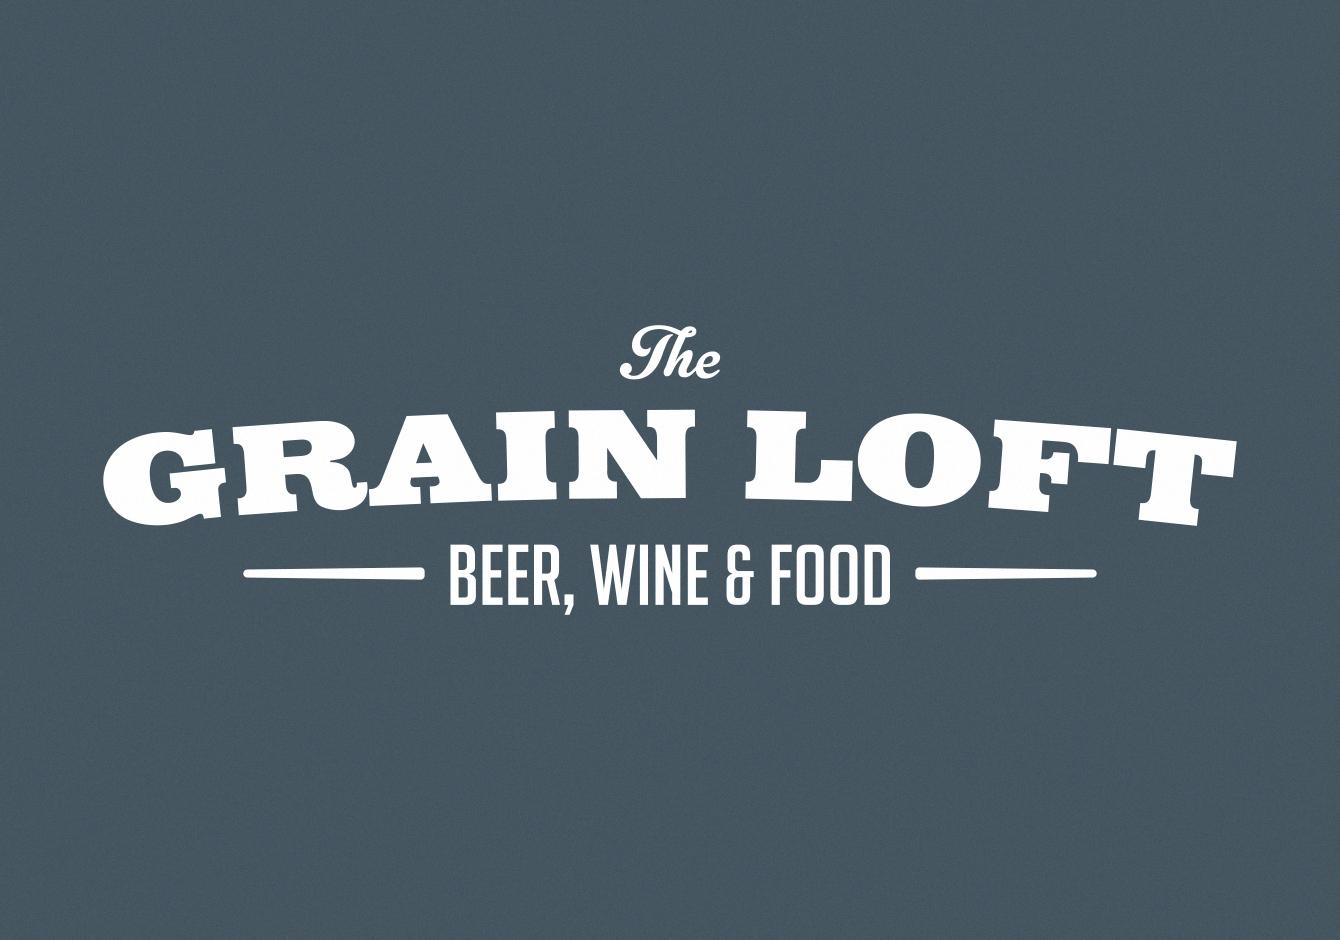 The Grain Loft